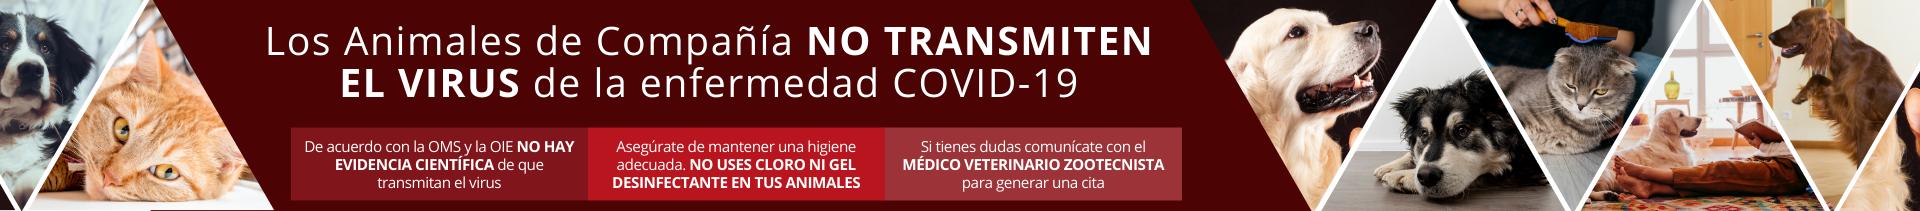 BANNER ANIMALES NO TRANSMITEN COVID (1).